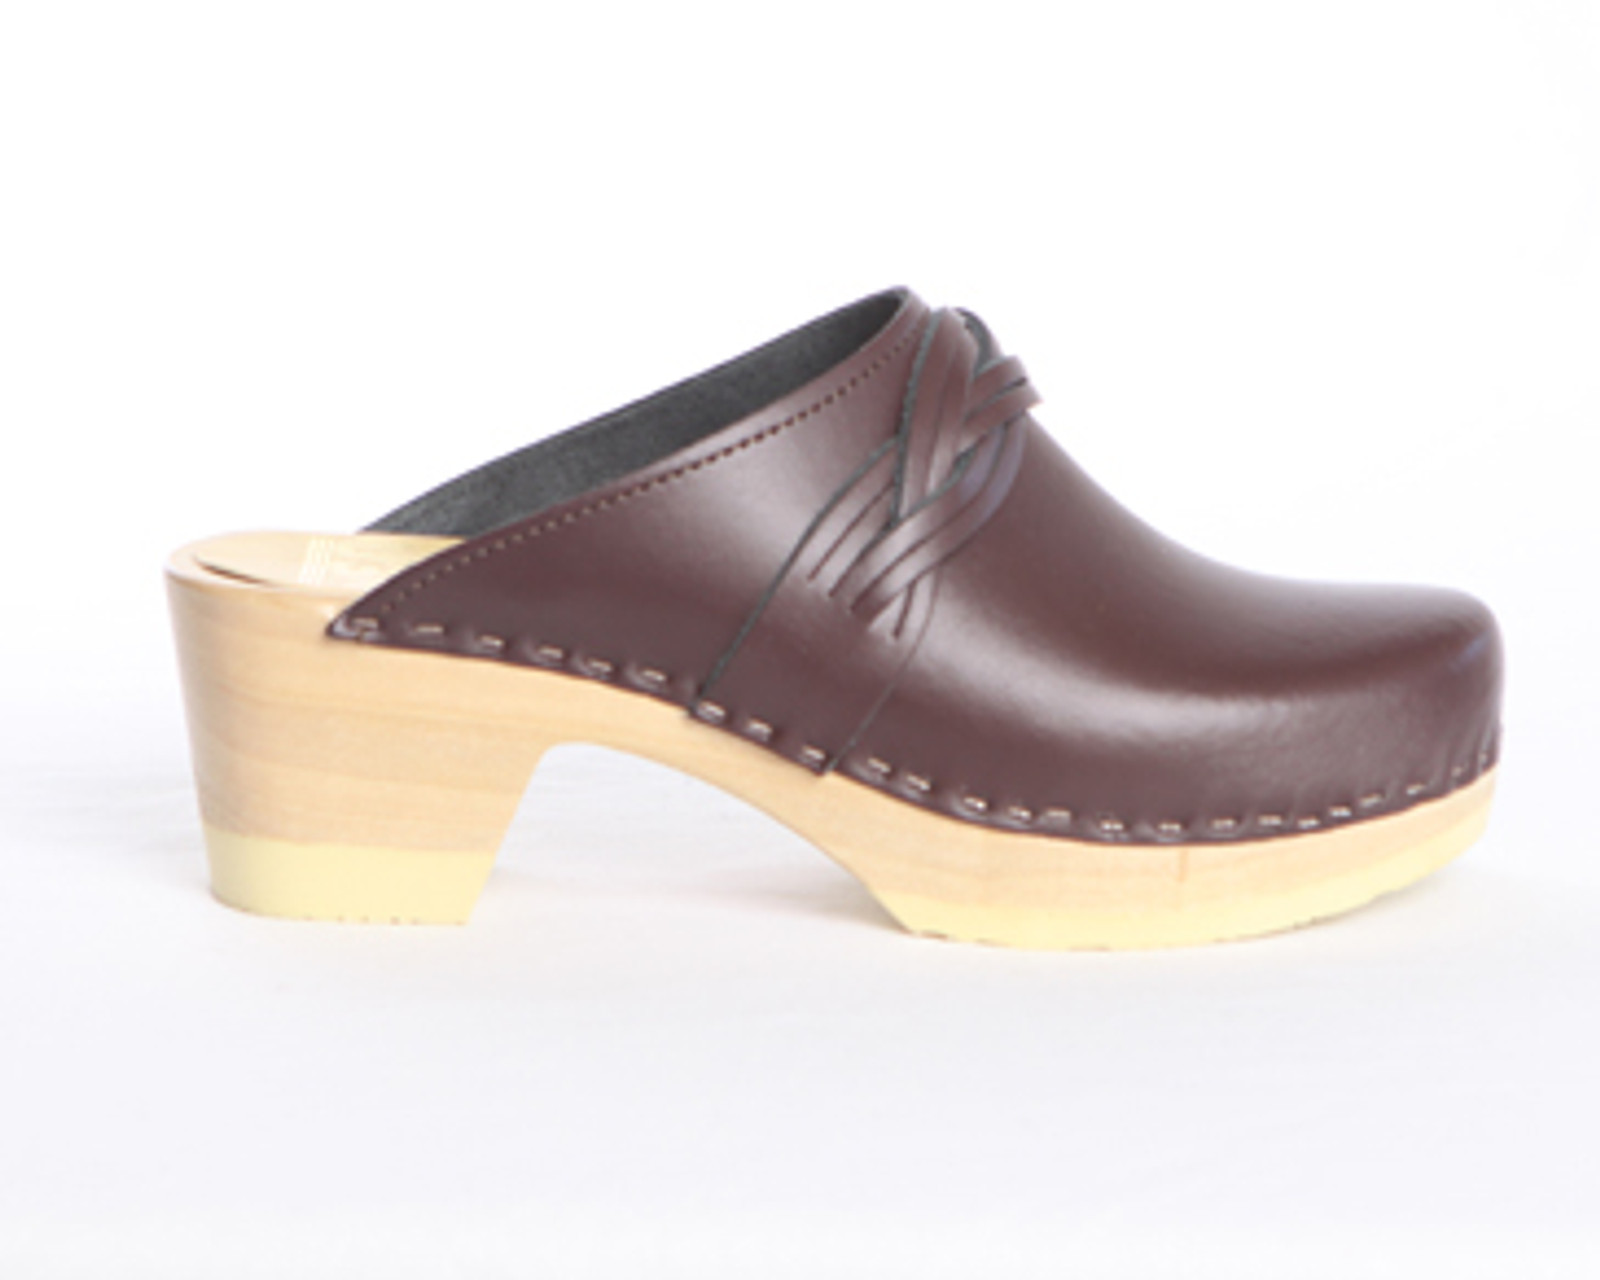 Double Braid Clogs - Mid Heels